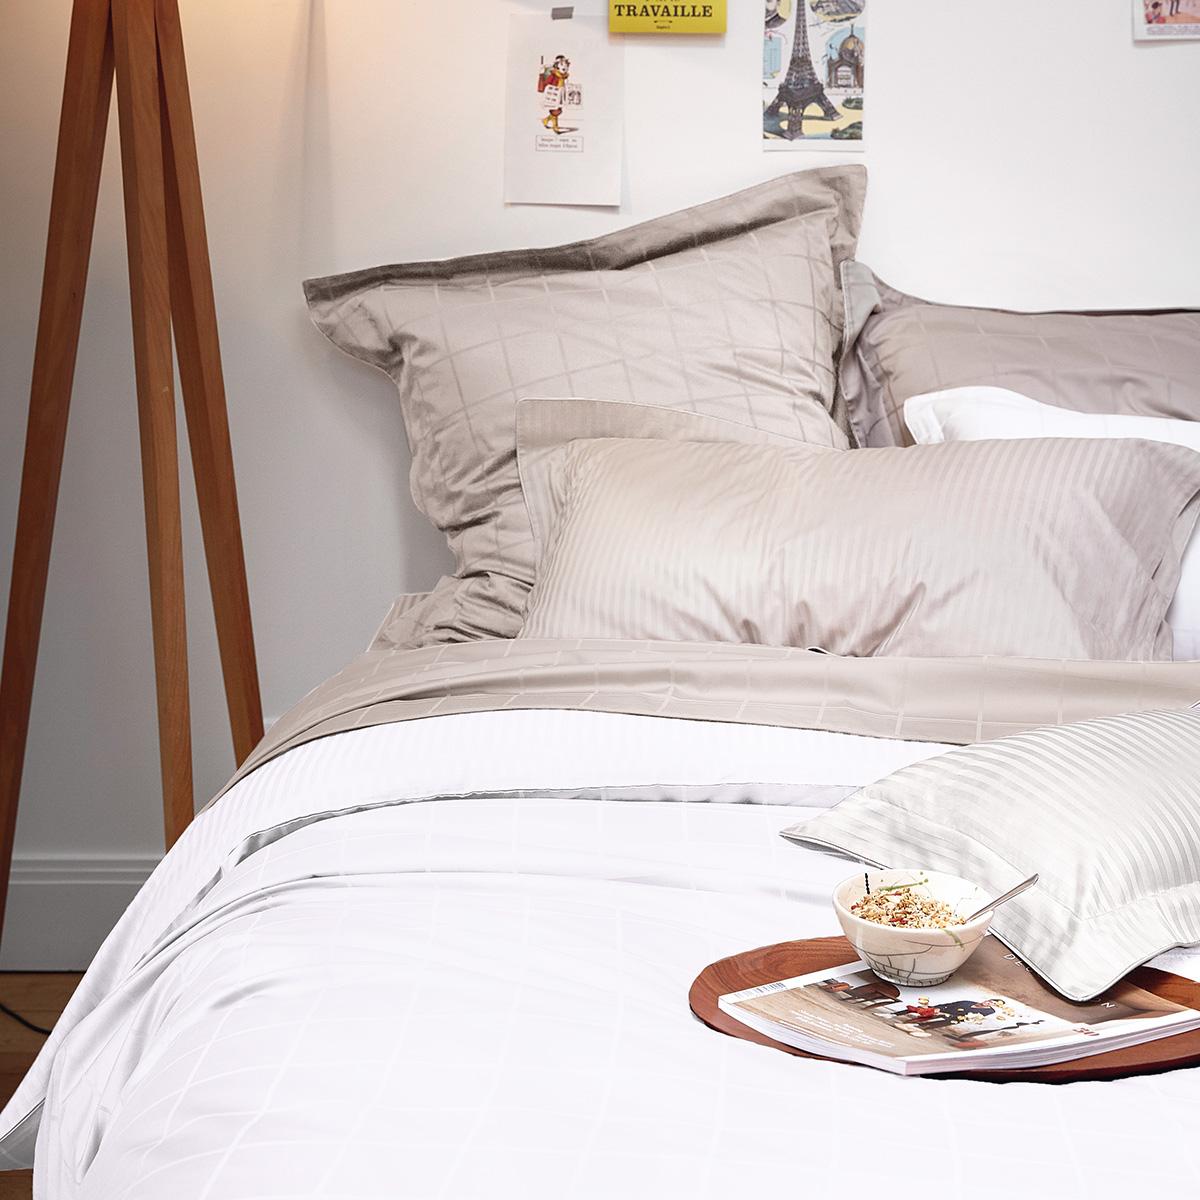 Drap housse satin Blanc 120 x 200 cm